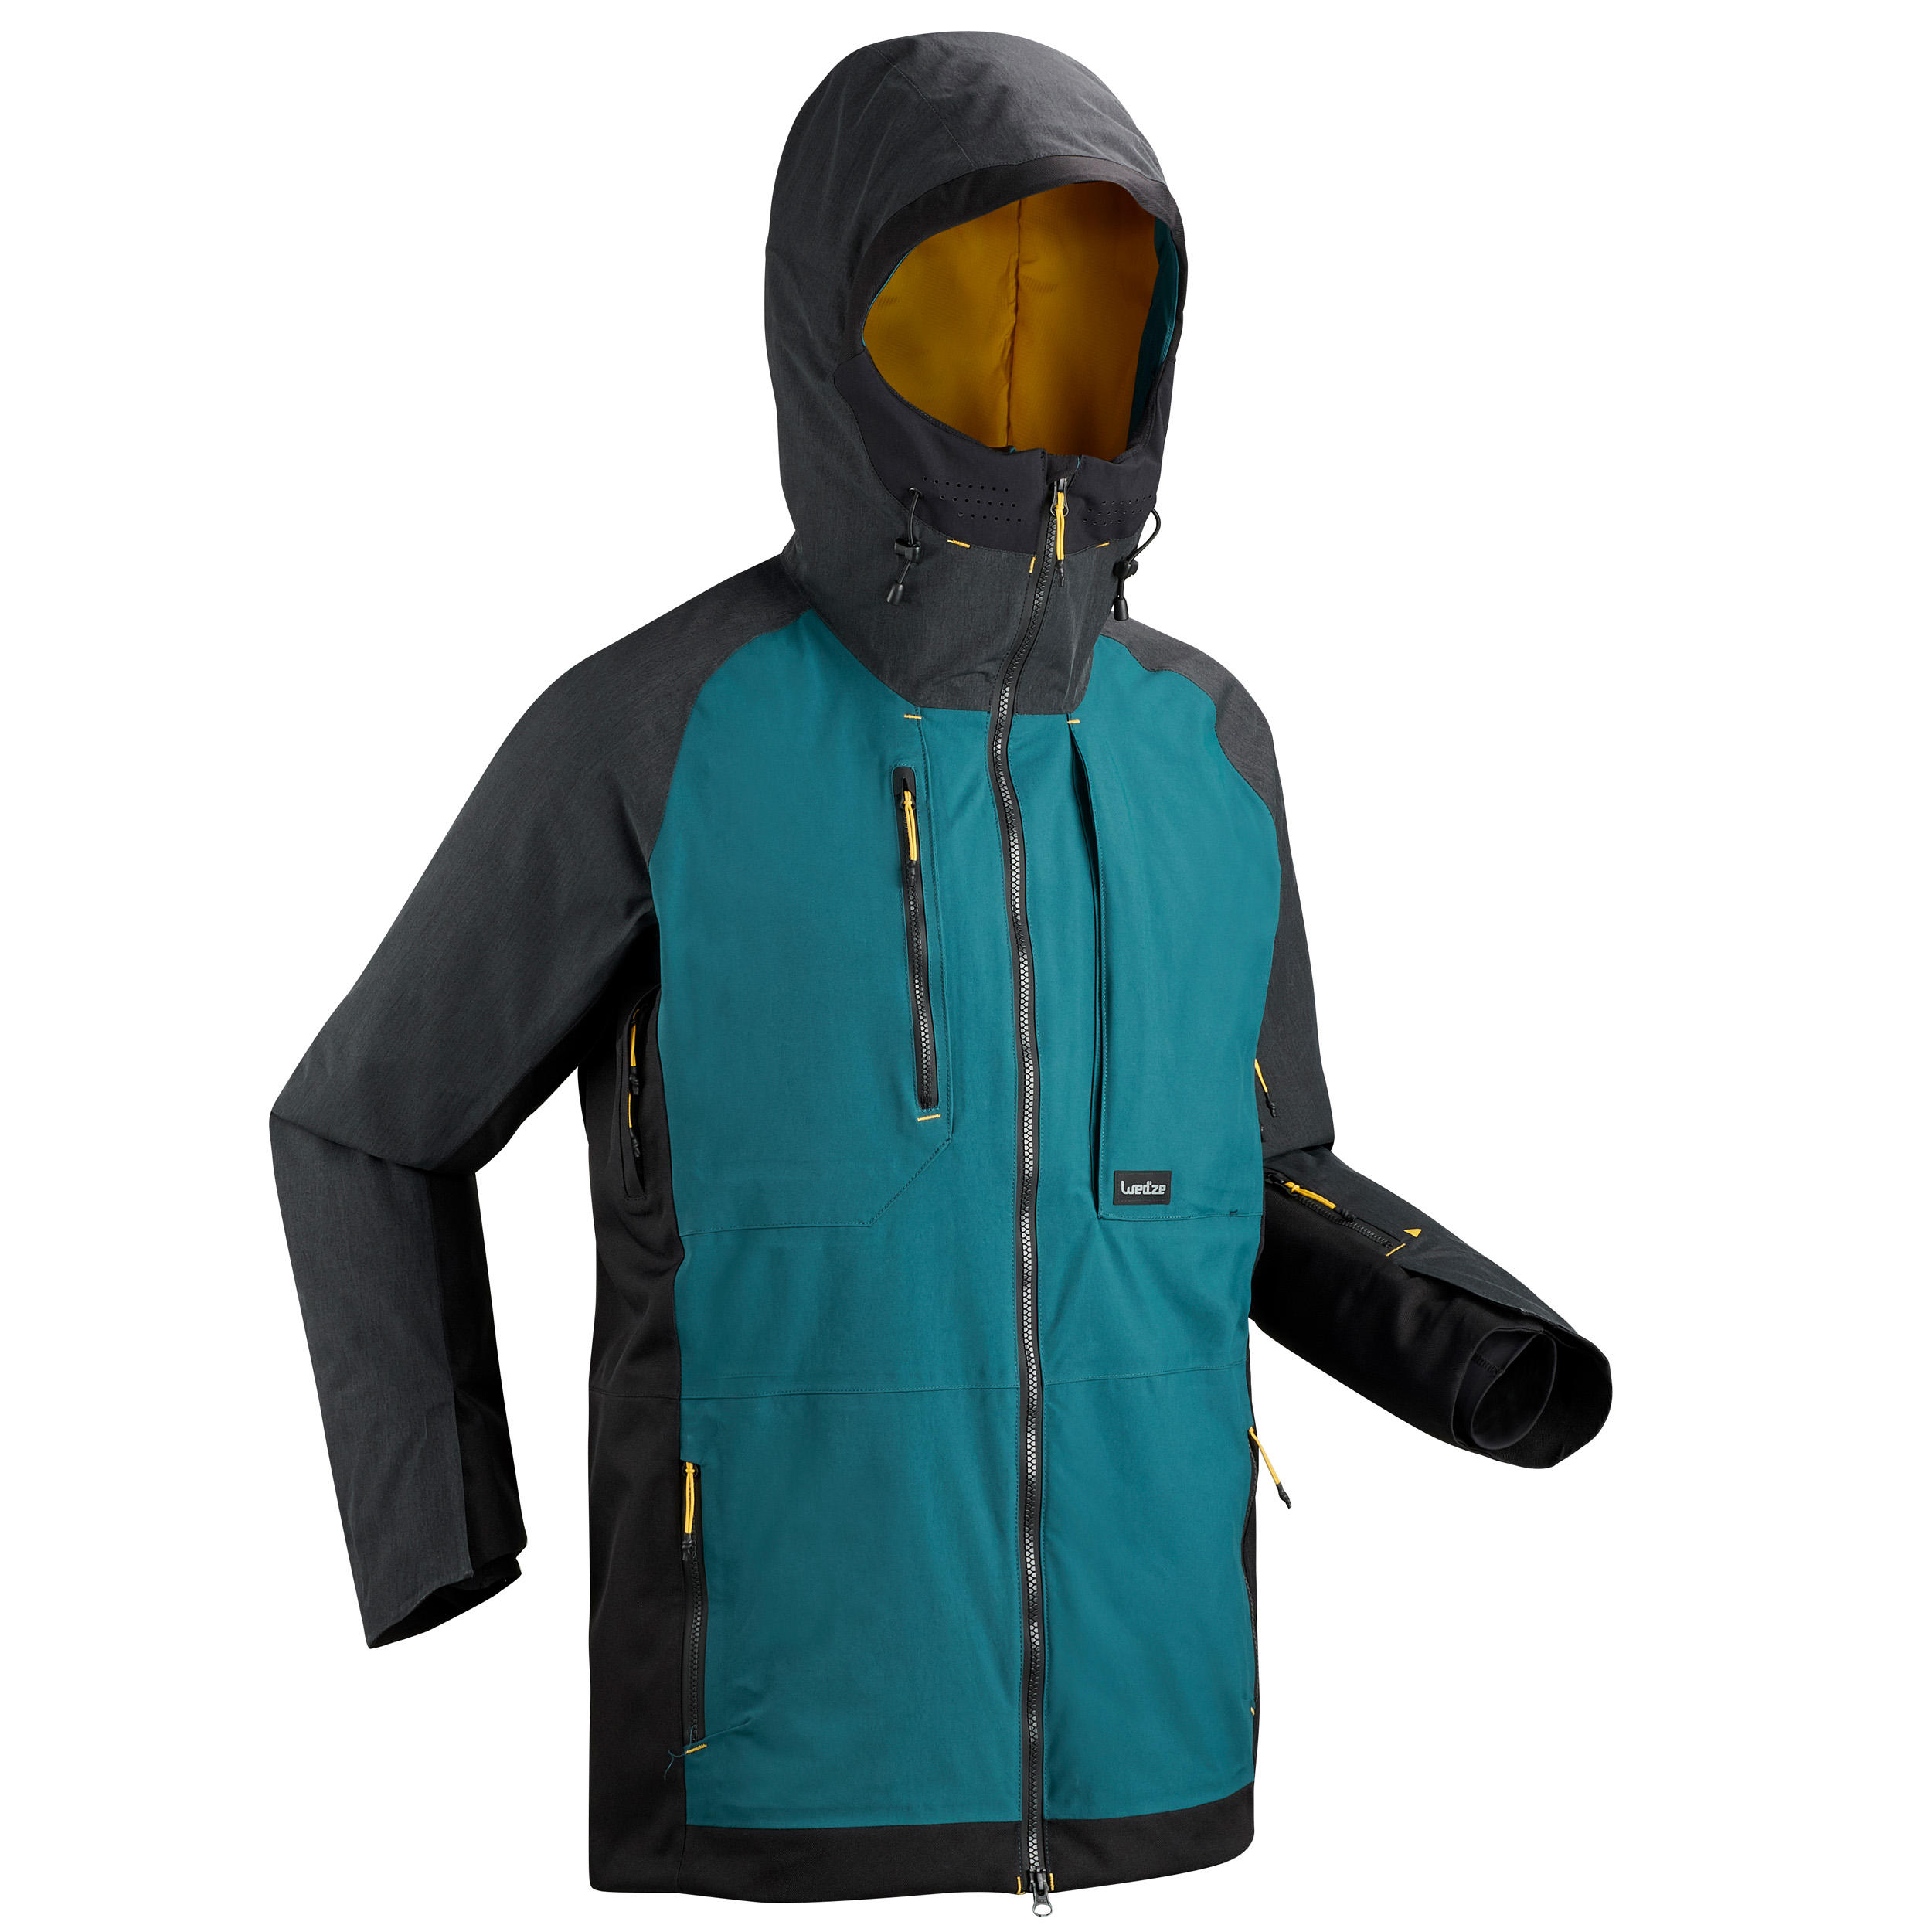 Geacă Snowboard JKT 900 imagine